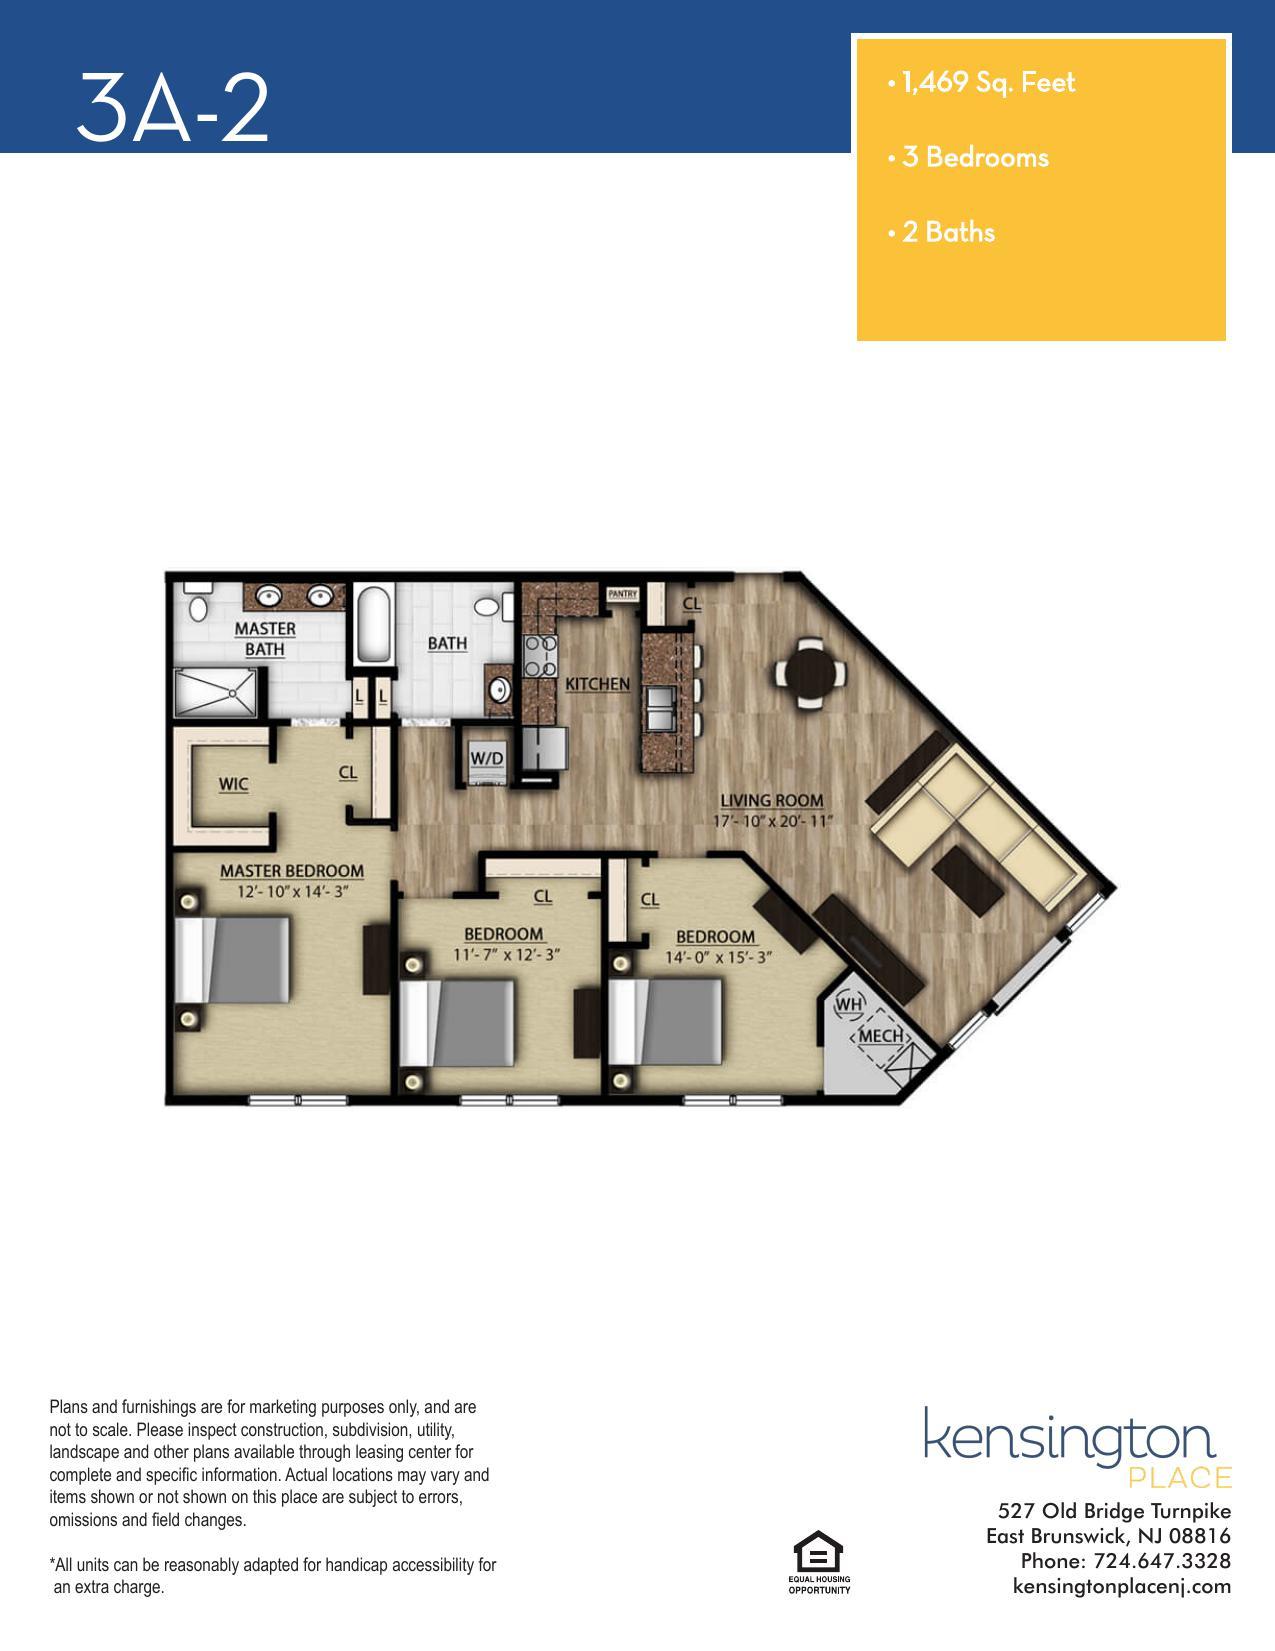 3A2 Floor Plan